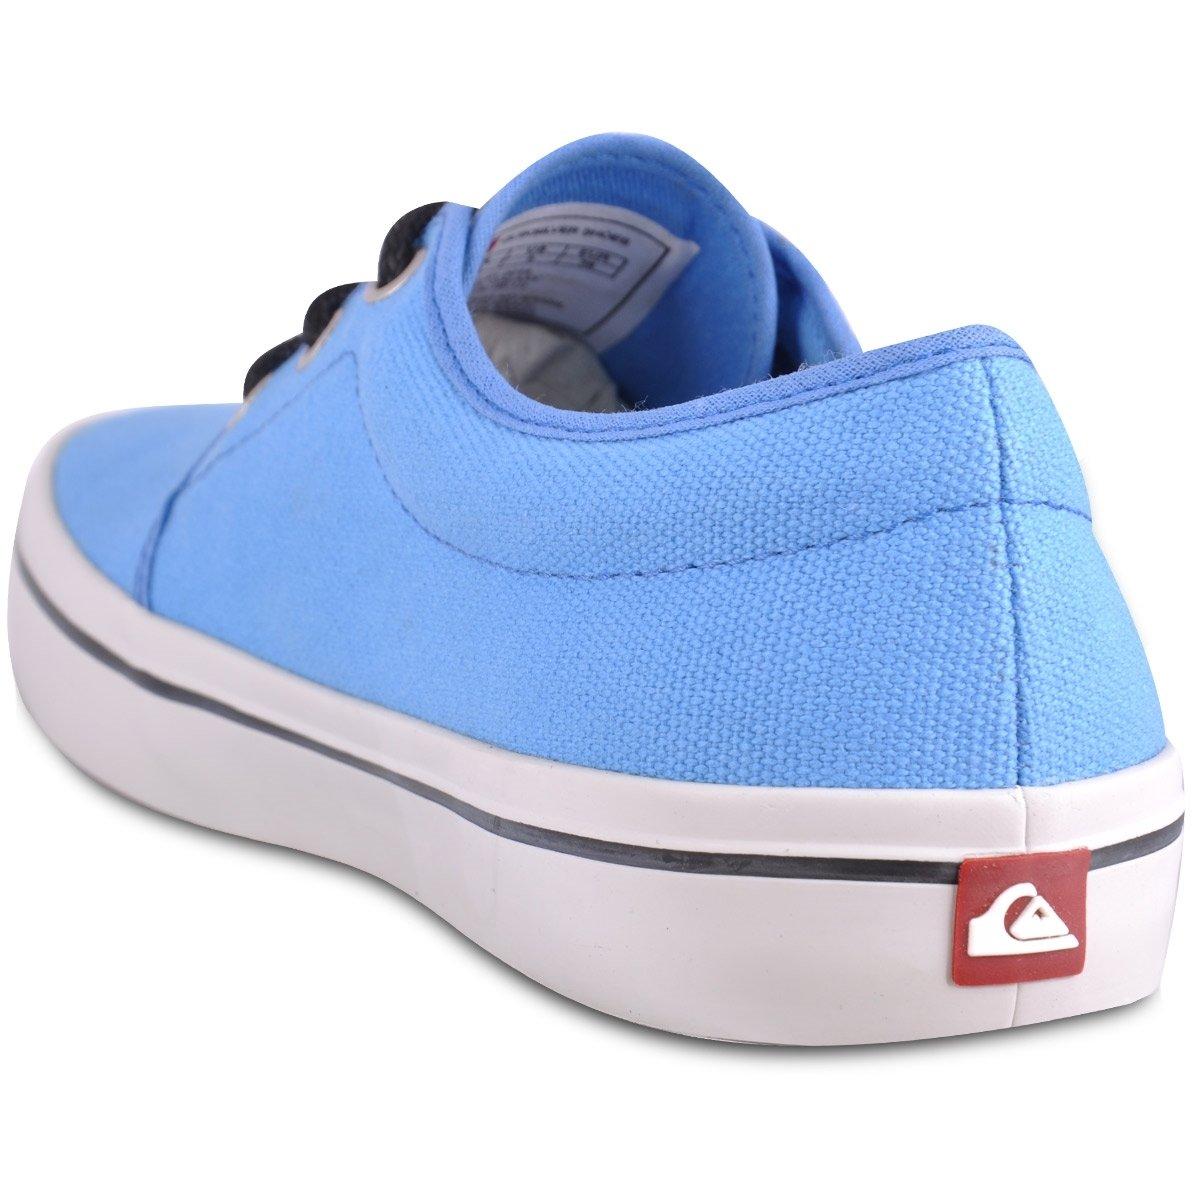 Tênis Quiksilver Galaxy - Azul - Compre Agora   Netshoes 25167bf20d